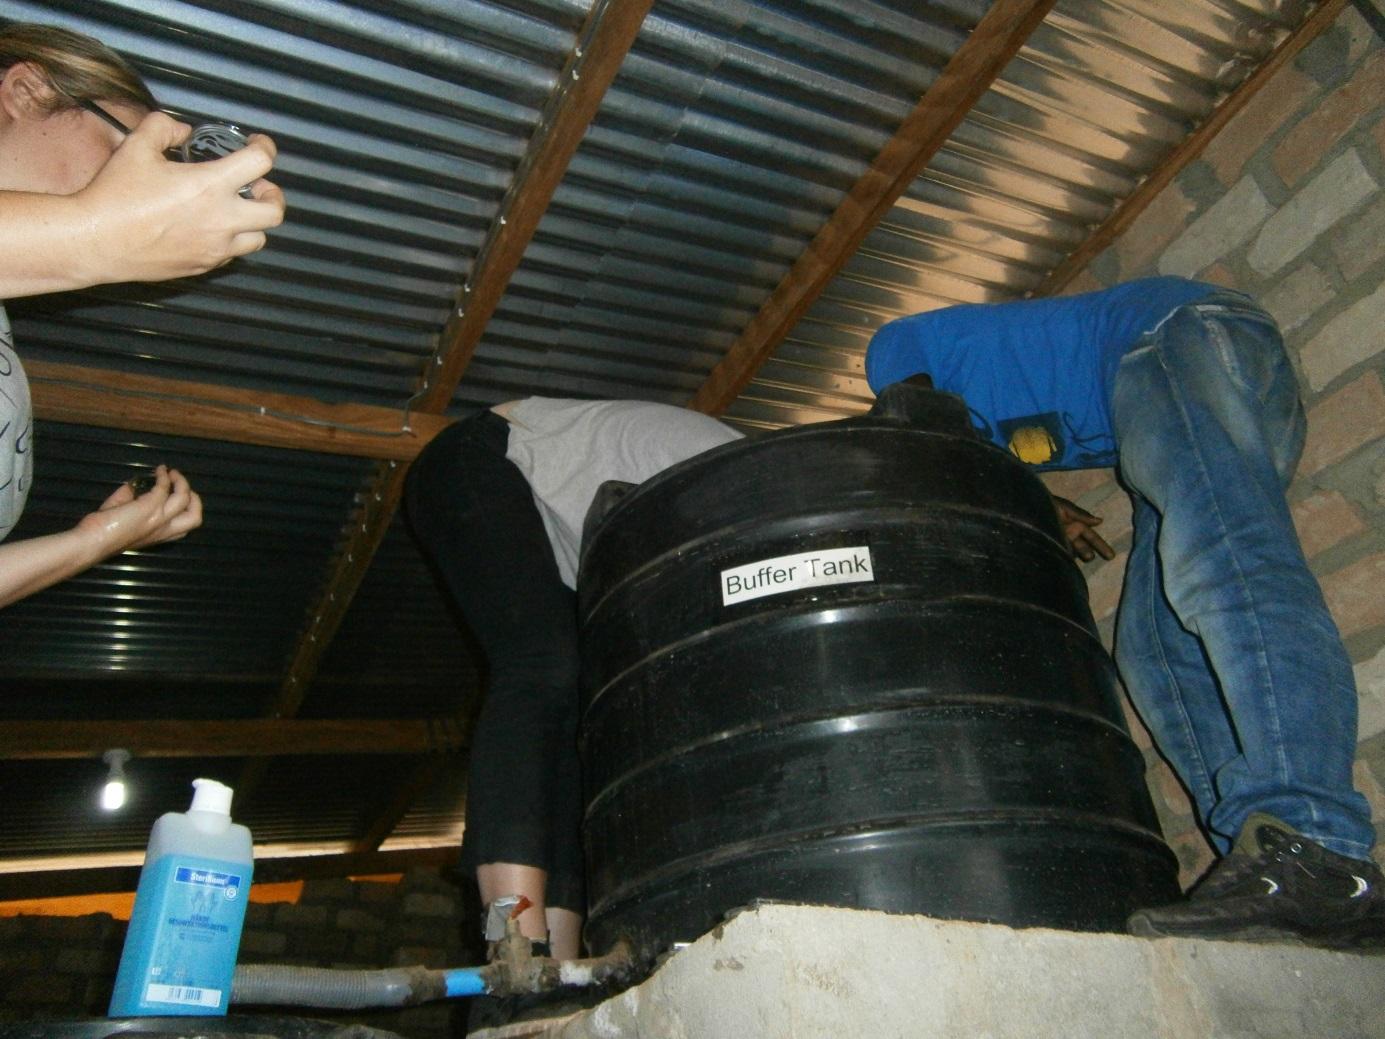 nach langer vorbereitung endlich in iyolwa iyolwa water sanitation. Black Bedroom Furniture Sets. Home Design Ideas